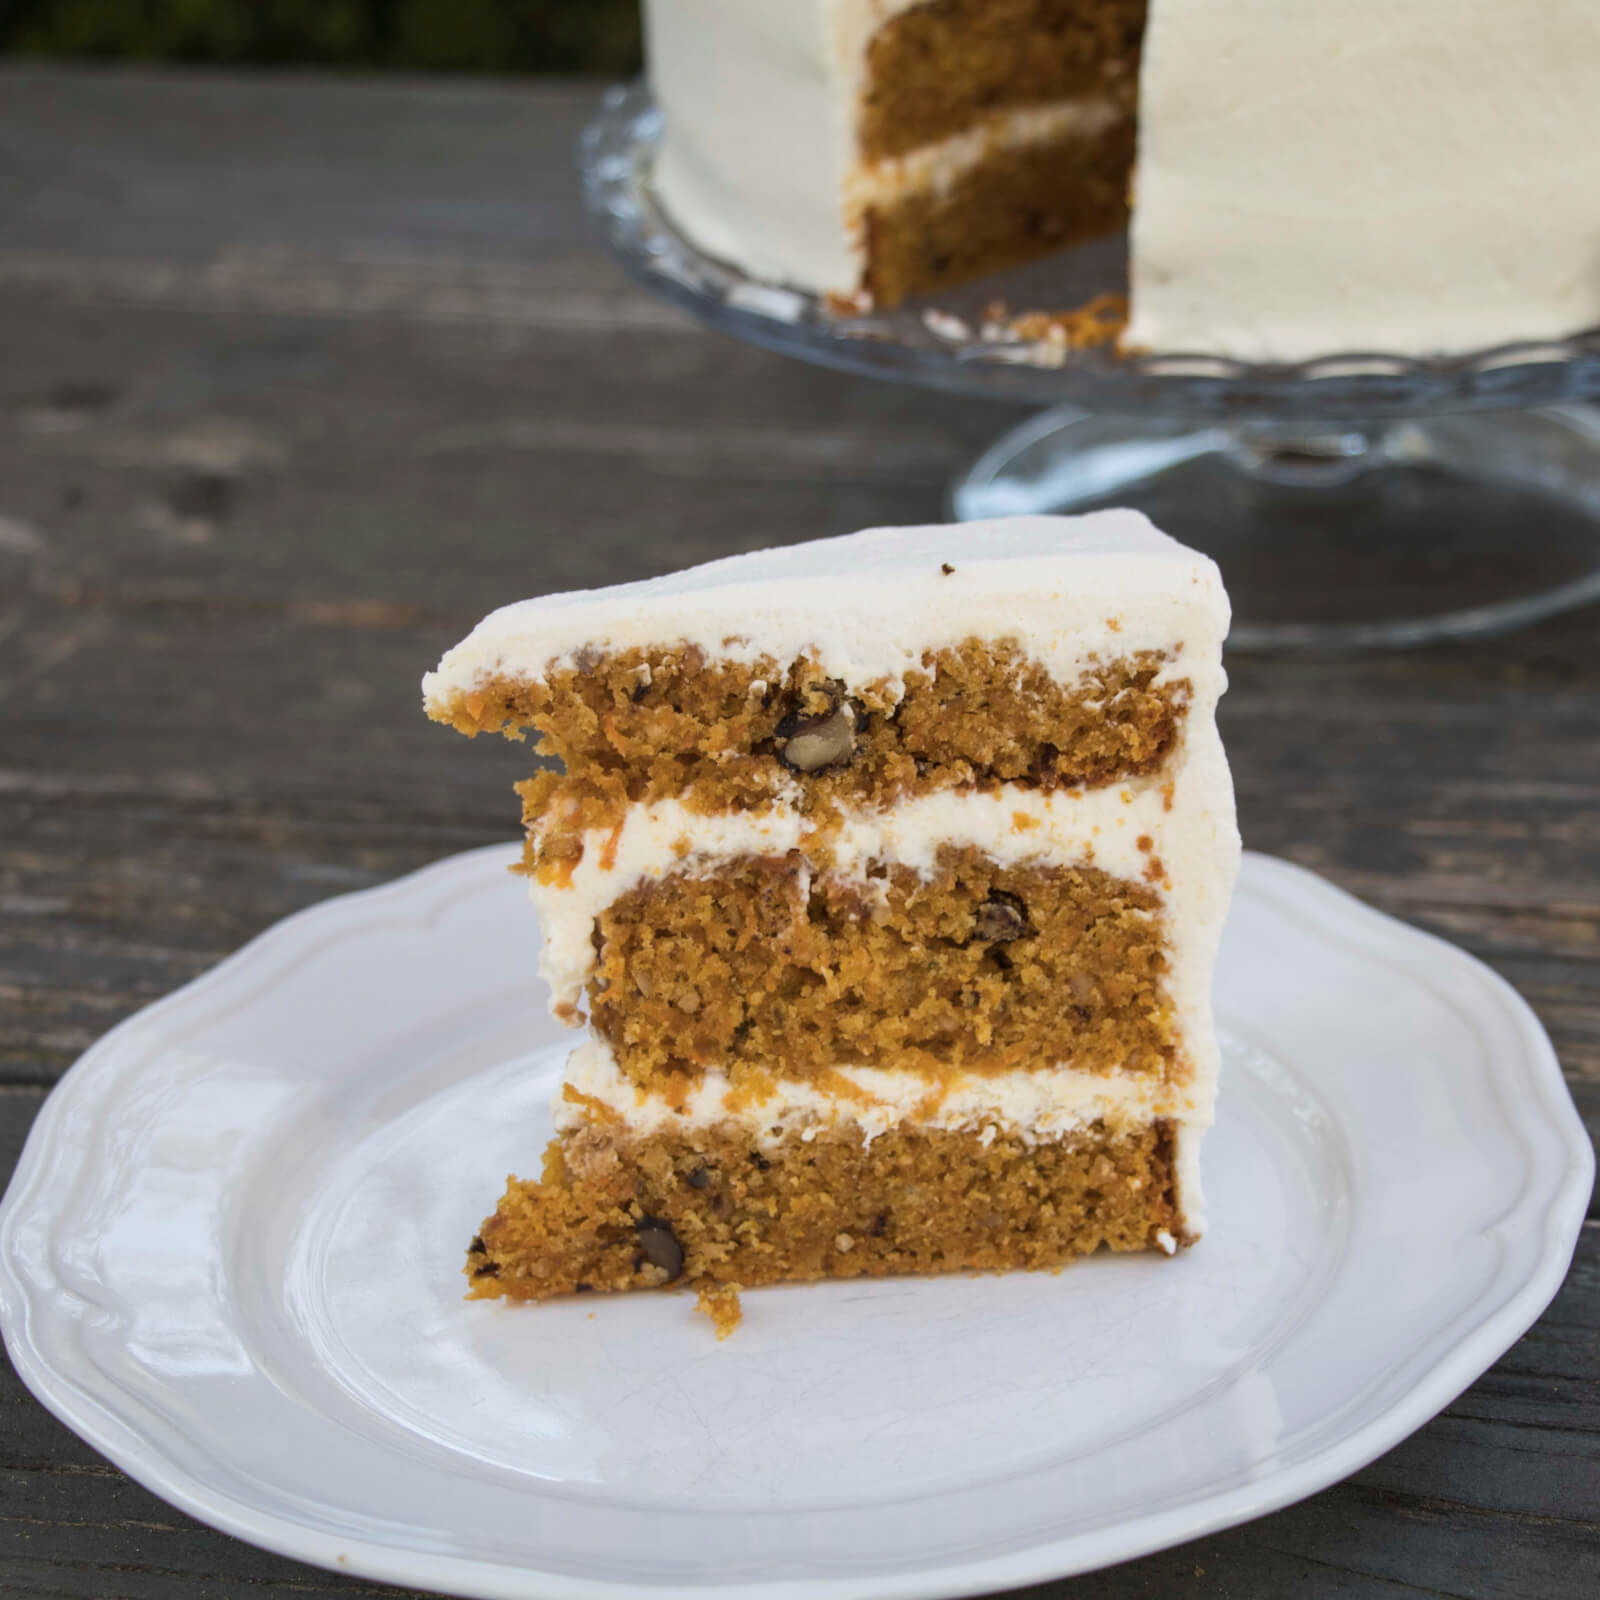 Carrot cake_best carrot cake recipe_carrot cake recipe from scratch